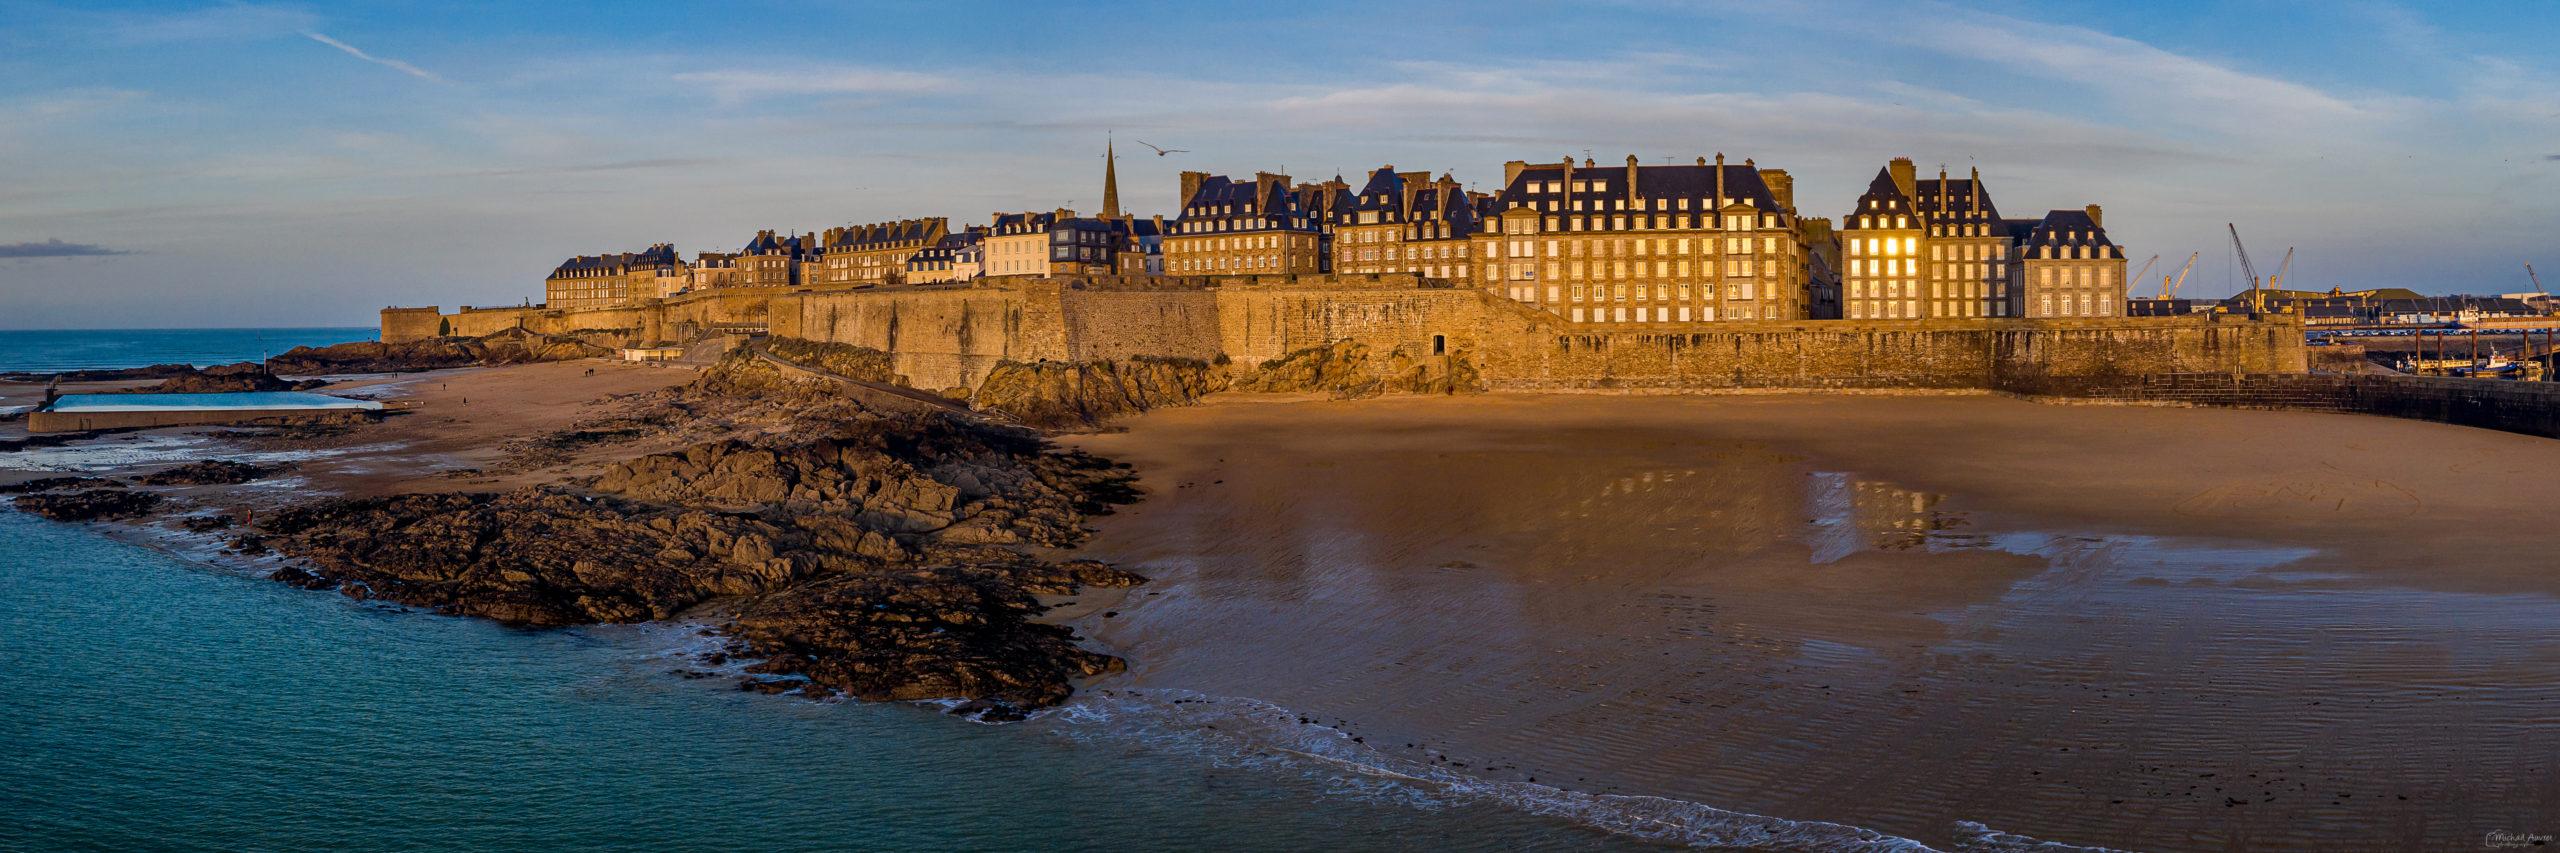 panoramique bretagne saint Malo intra muros